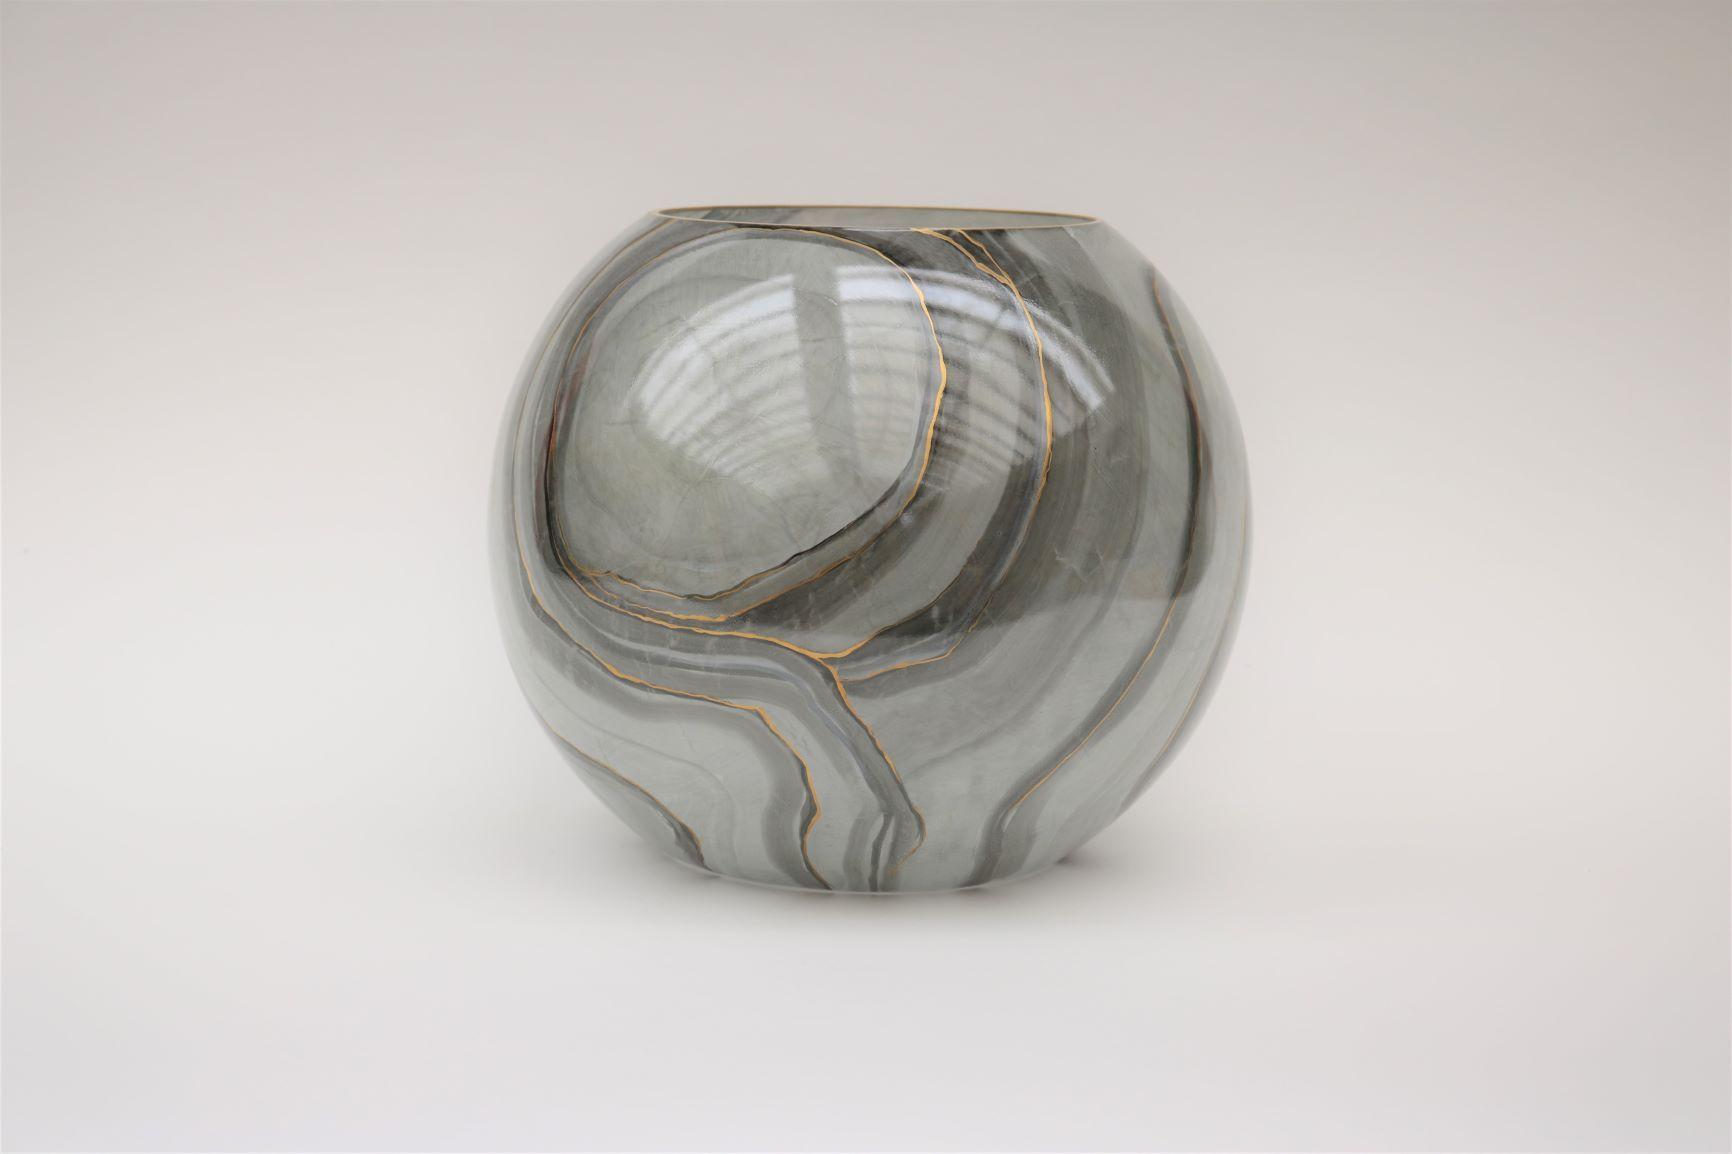 Vetrerie di Empoli marble-like glassware - hand made in Italy